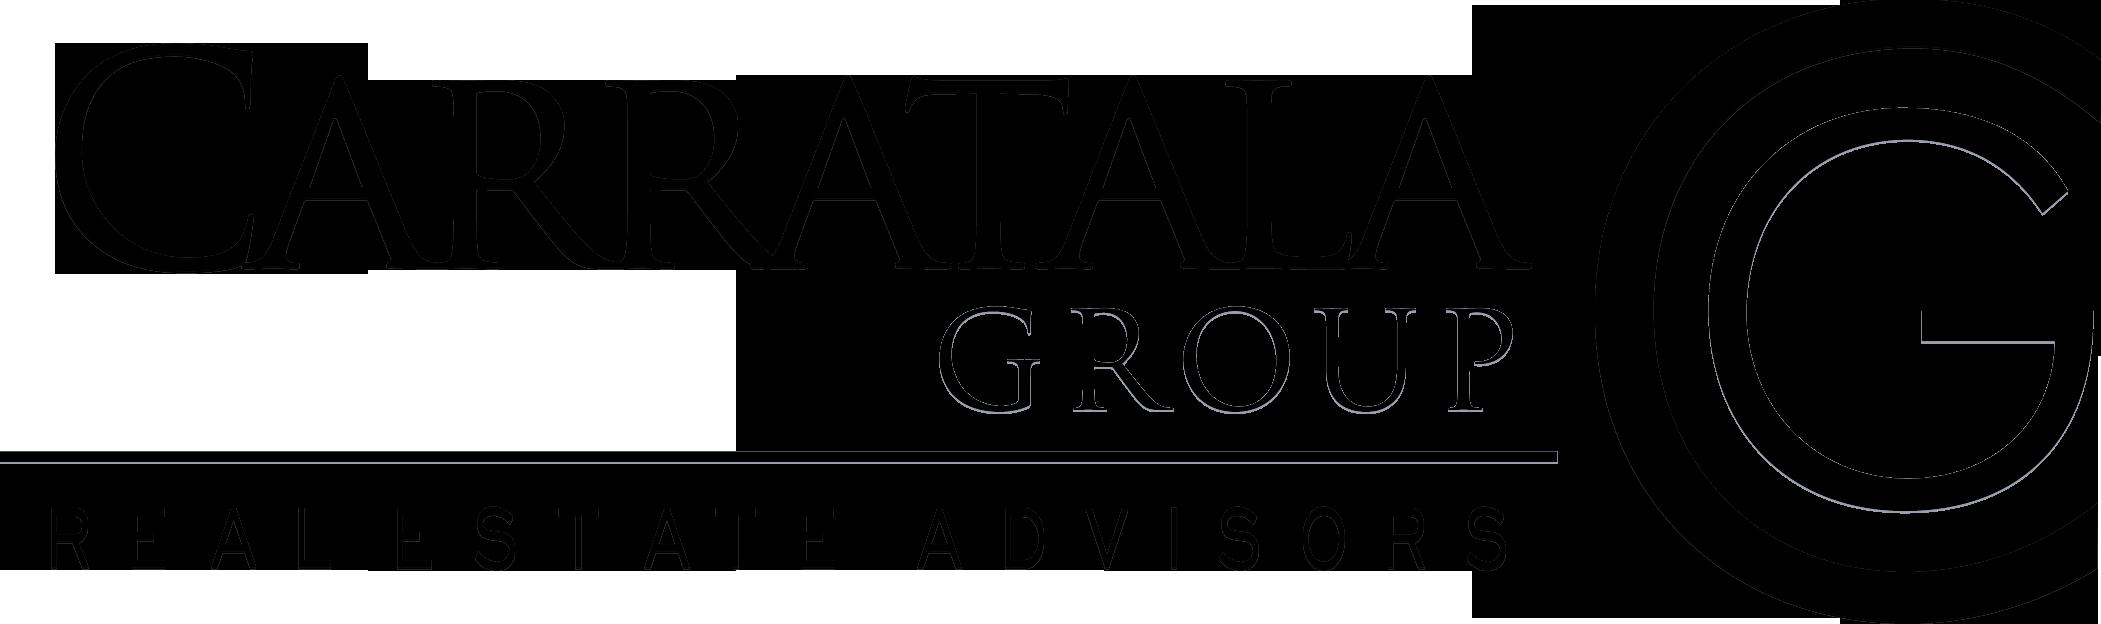 Carratala Group